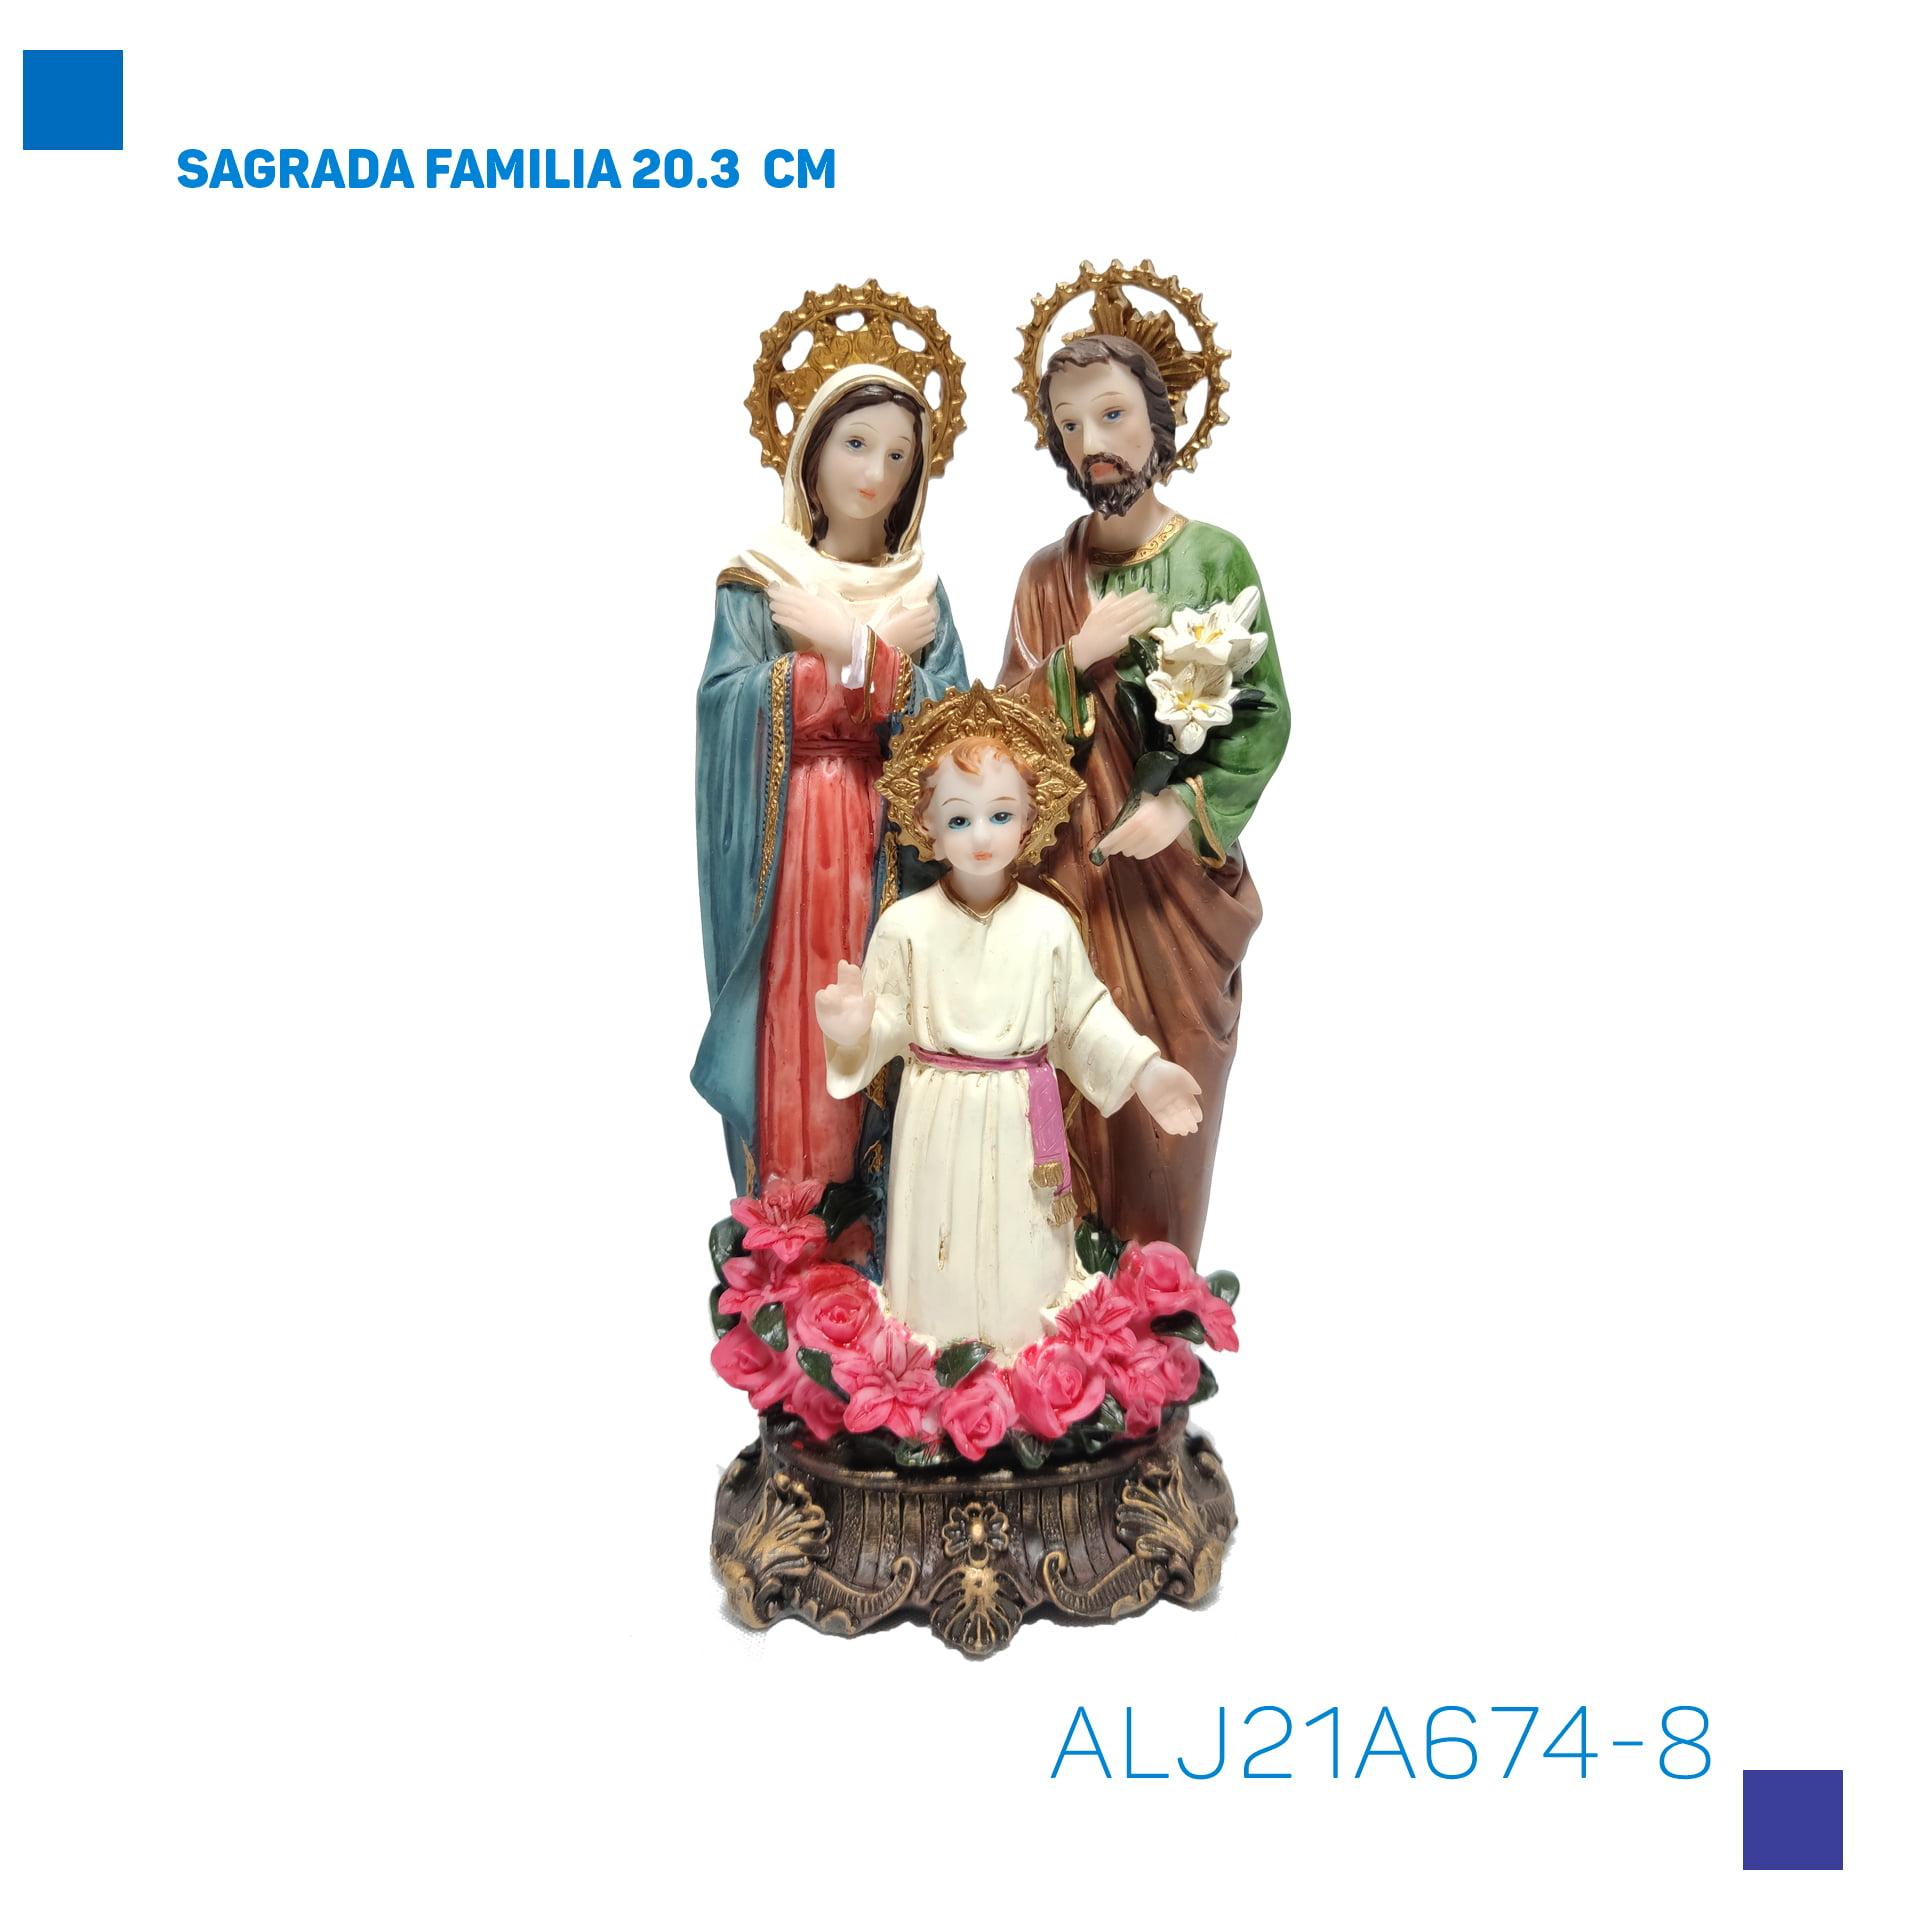 Bira Artigos Religiosos - SAGRADA FAMILIA 20.3  CM - Cód. ALJ21A674-8